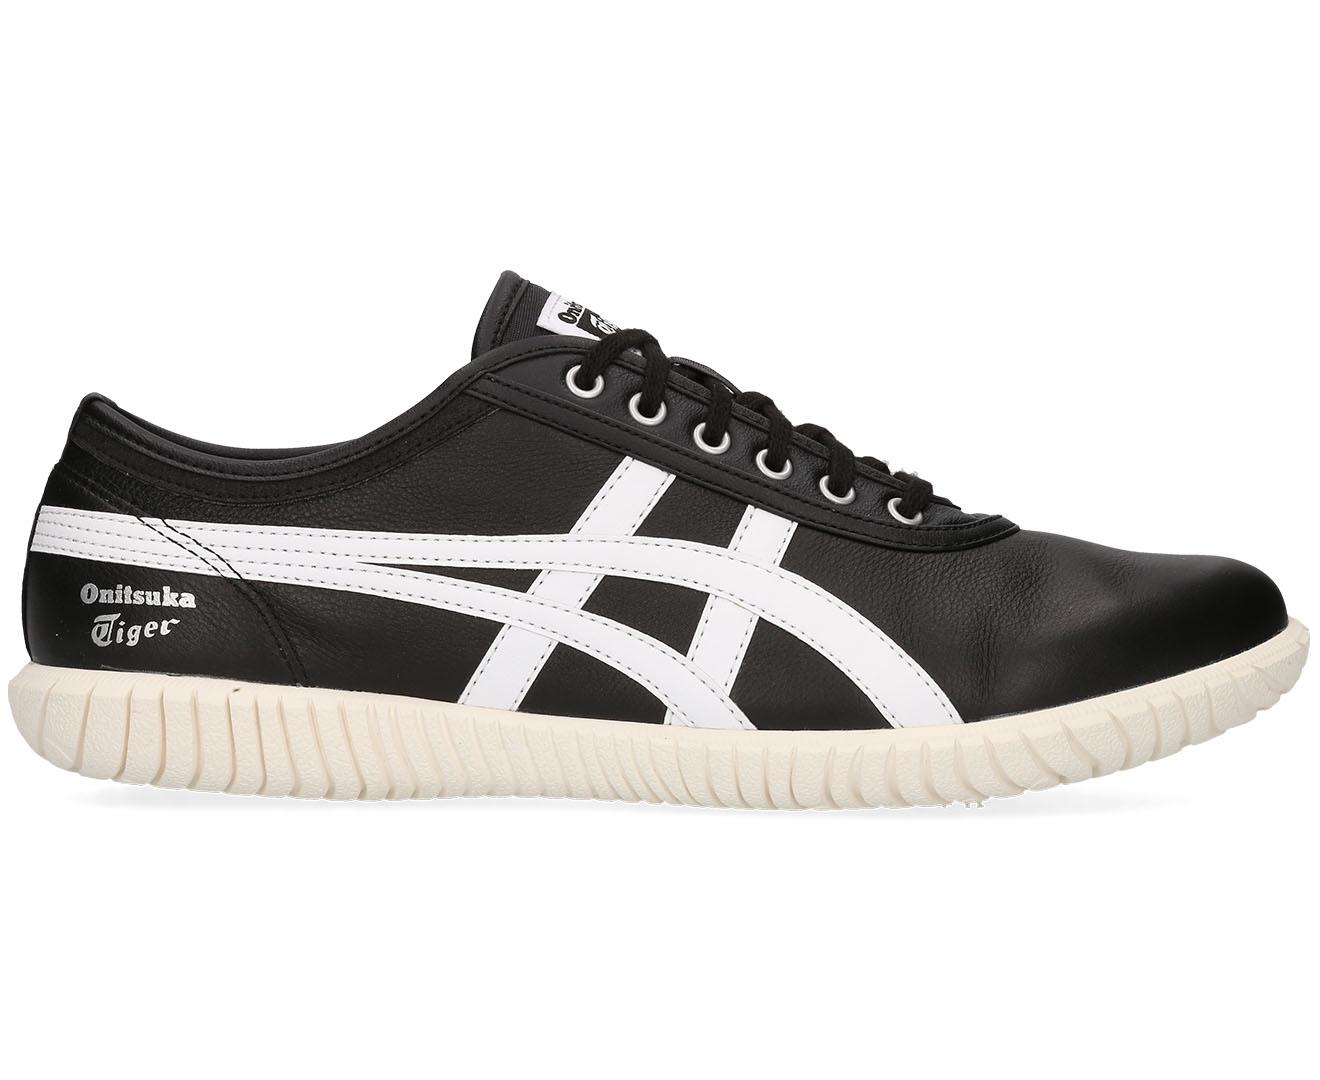 promo code f3ded e6448 Details about Onitsuka Tiger Unisex Tsunahiki Lifestyle Sneaker -  Black/White